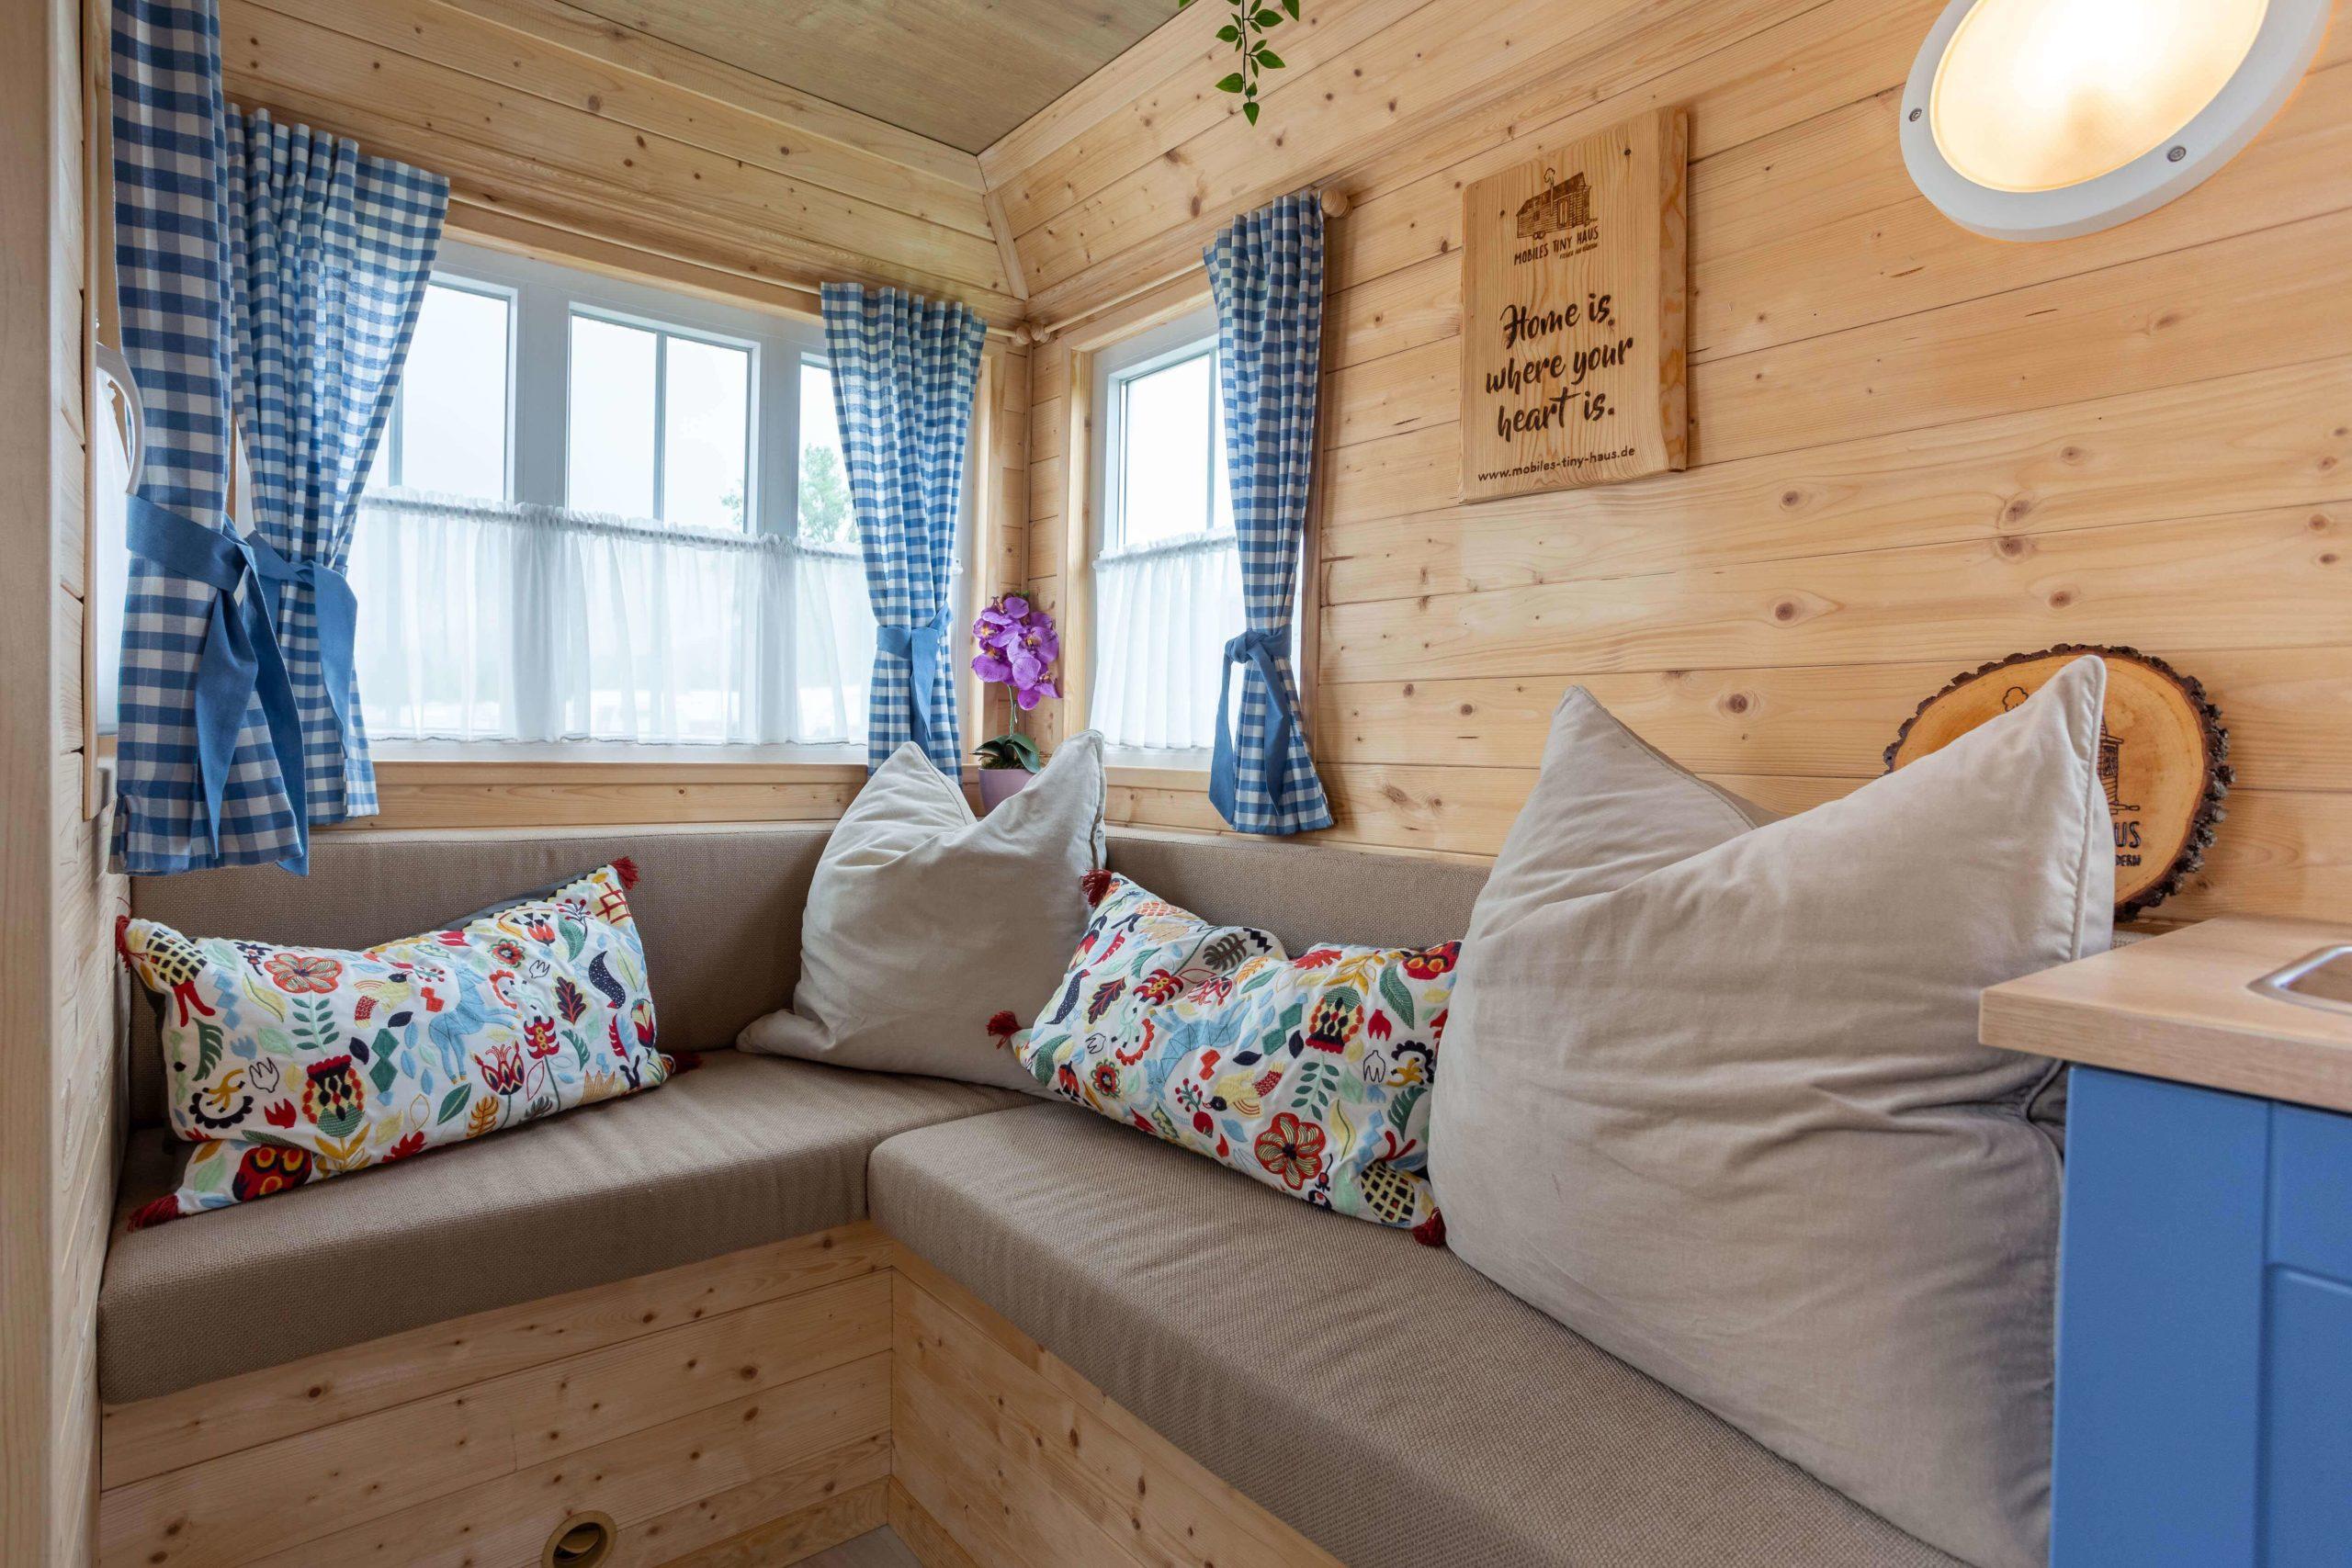 mobiles-tiny-house-island-vital-camp-gmbh-25